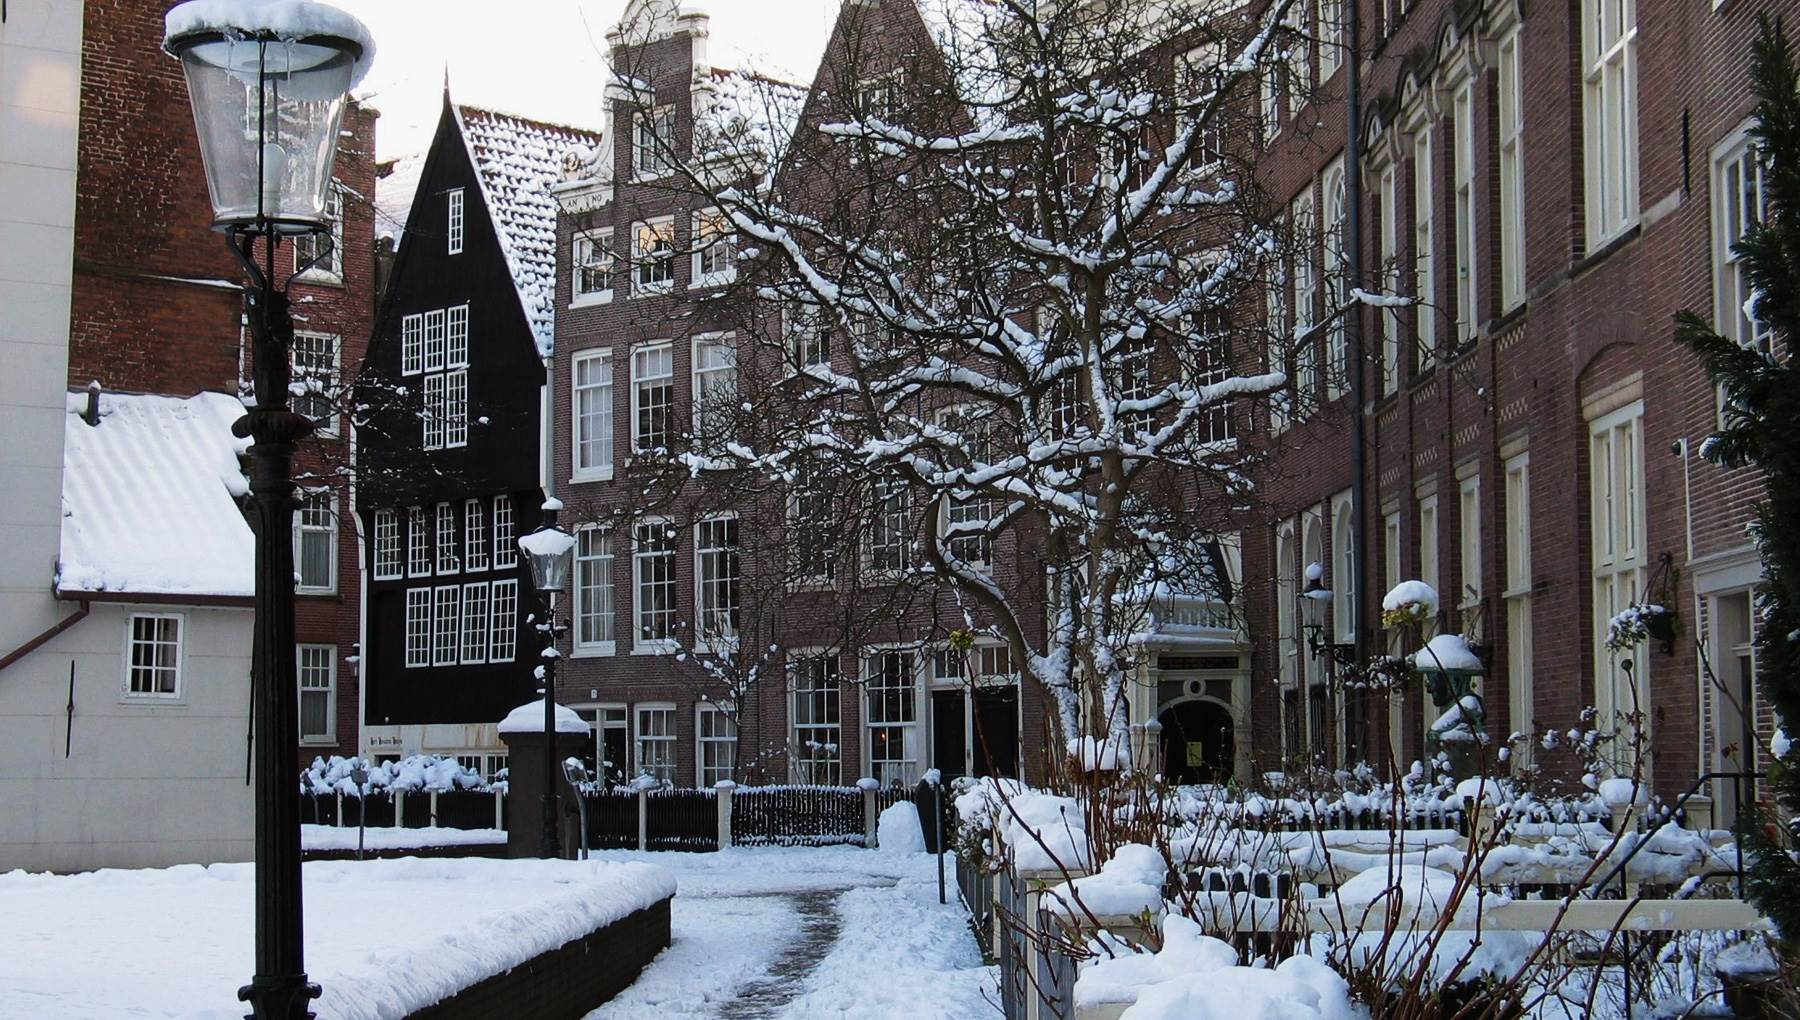 Snowy Begijnhof edwin van eis.jpg